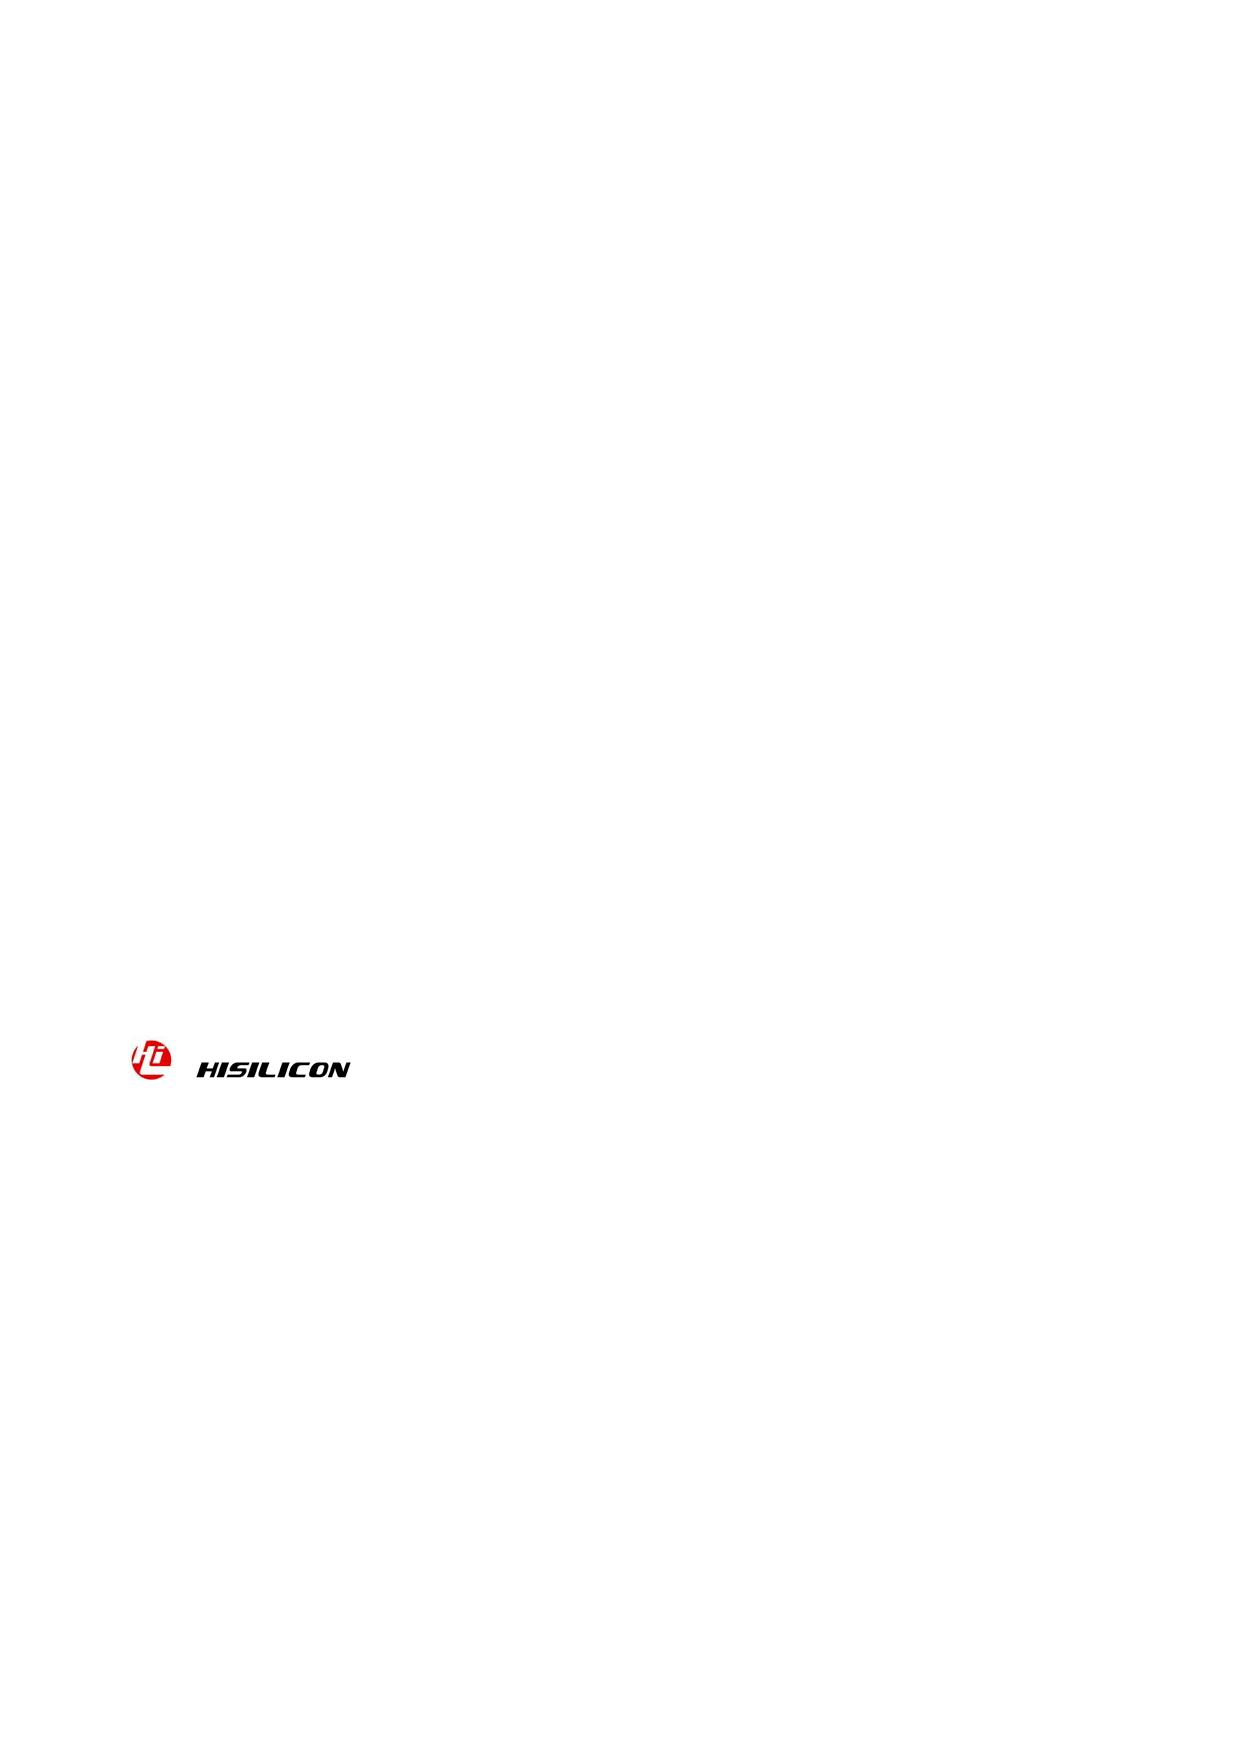 Hi3516 pdf, schematic